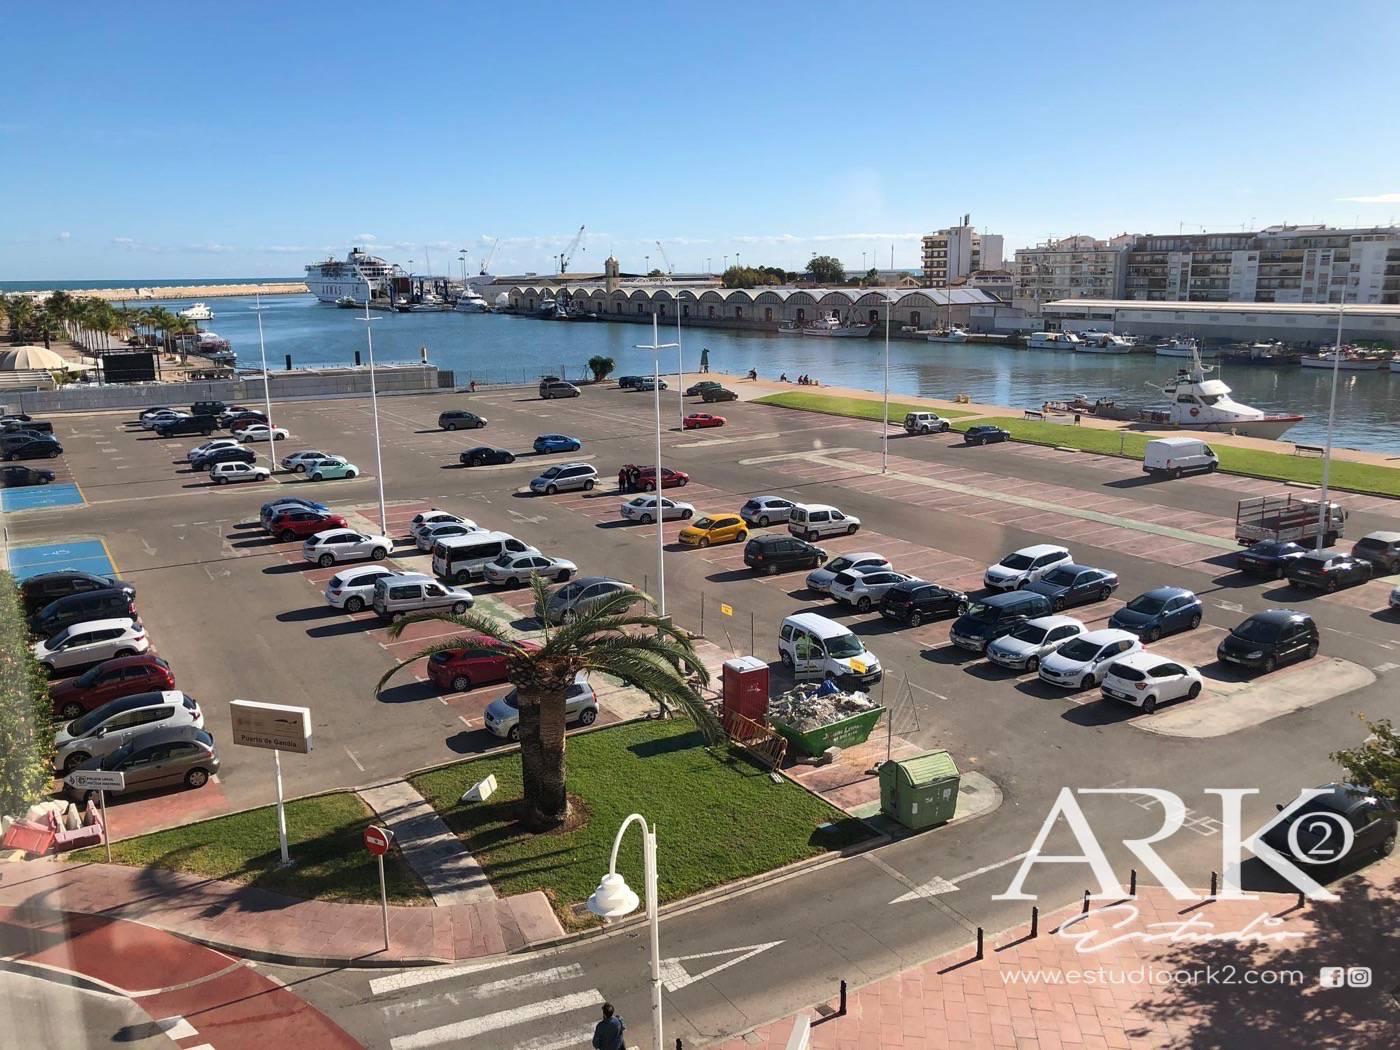 APARTAMENTO – GRAO DE GANDIA – REF. 19_457